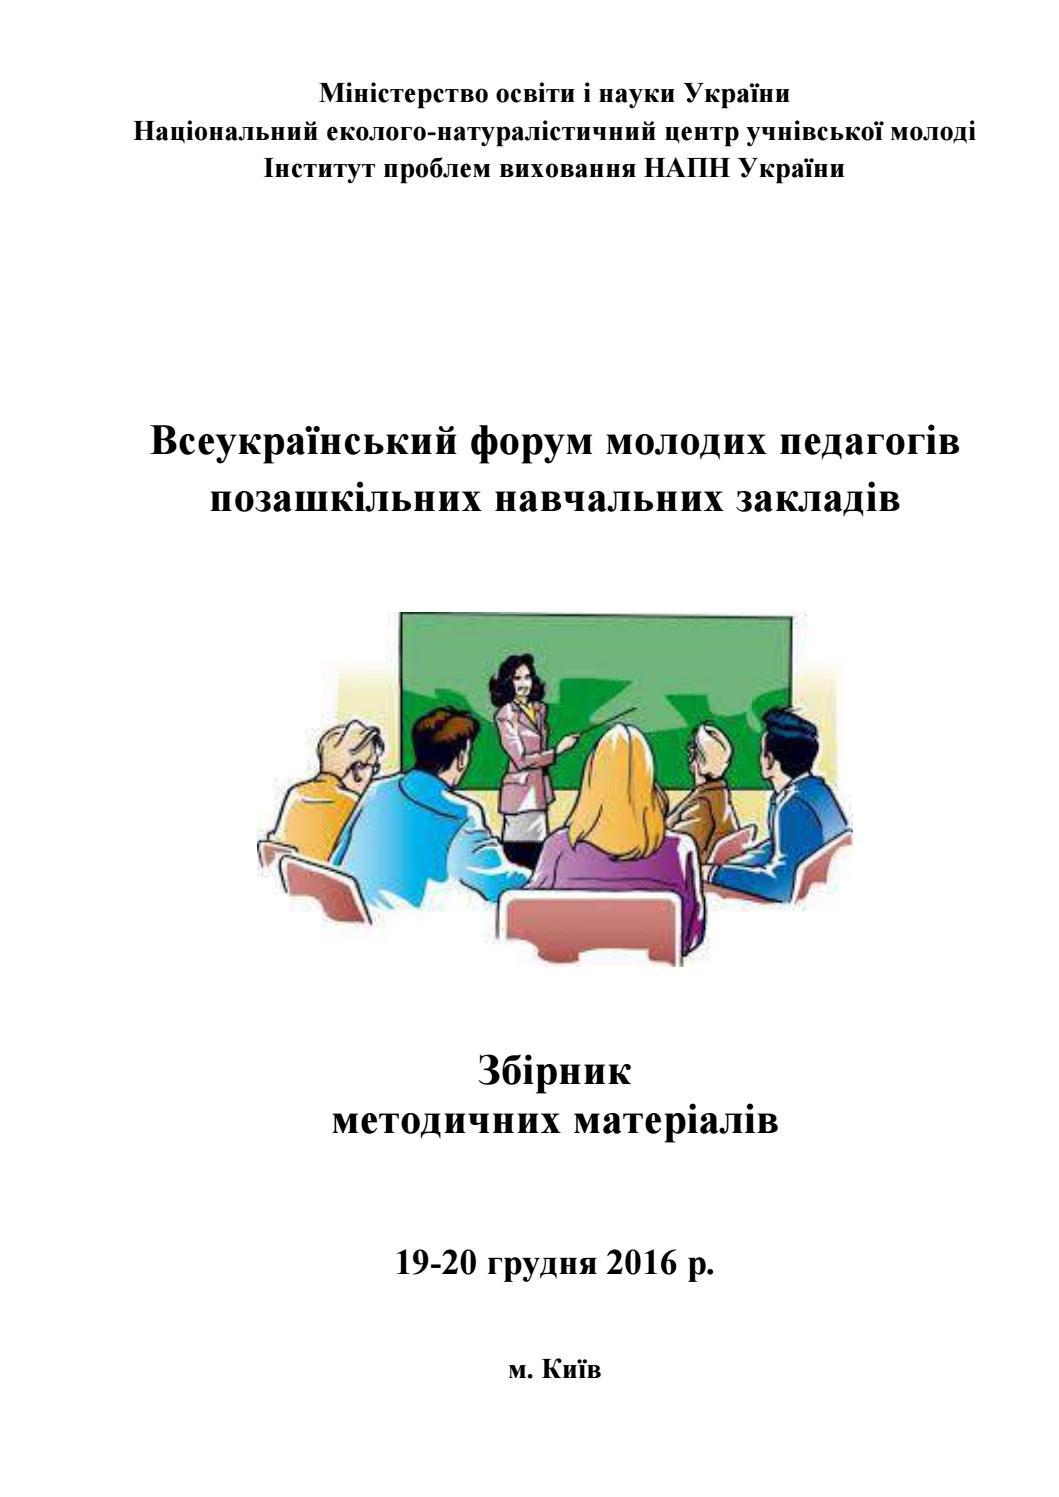 Всеукраїнський форум молодих педагогів позашкільних навчальних закладів by  НЕНЦ - issuu 6ecdc2af216af